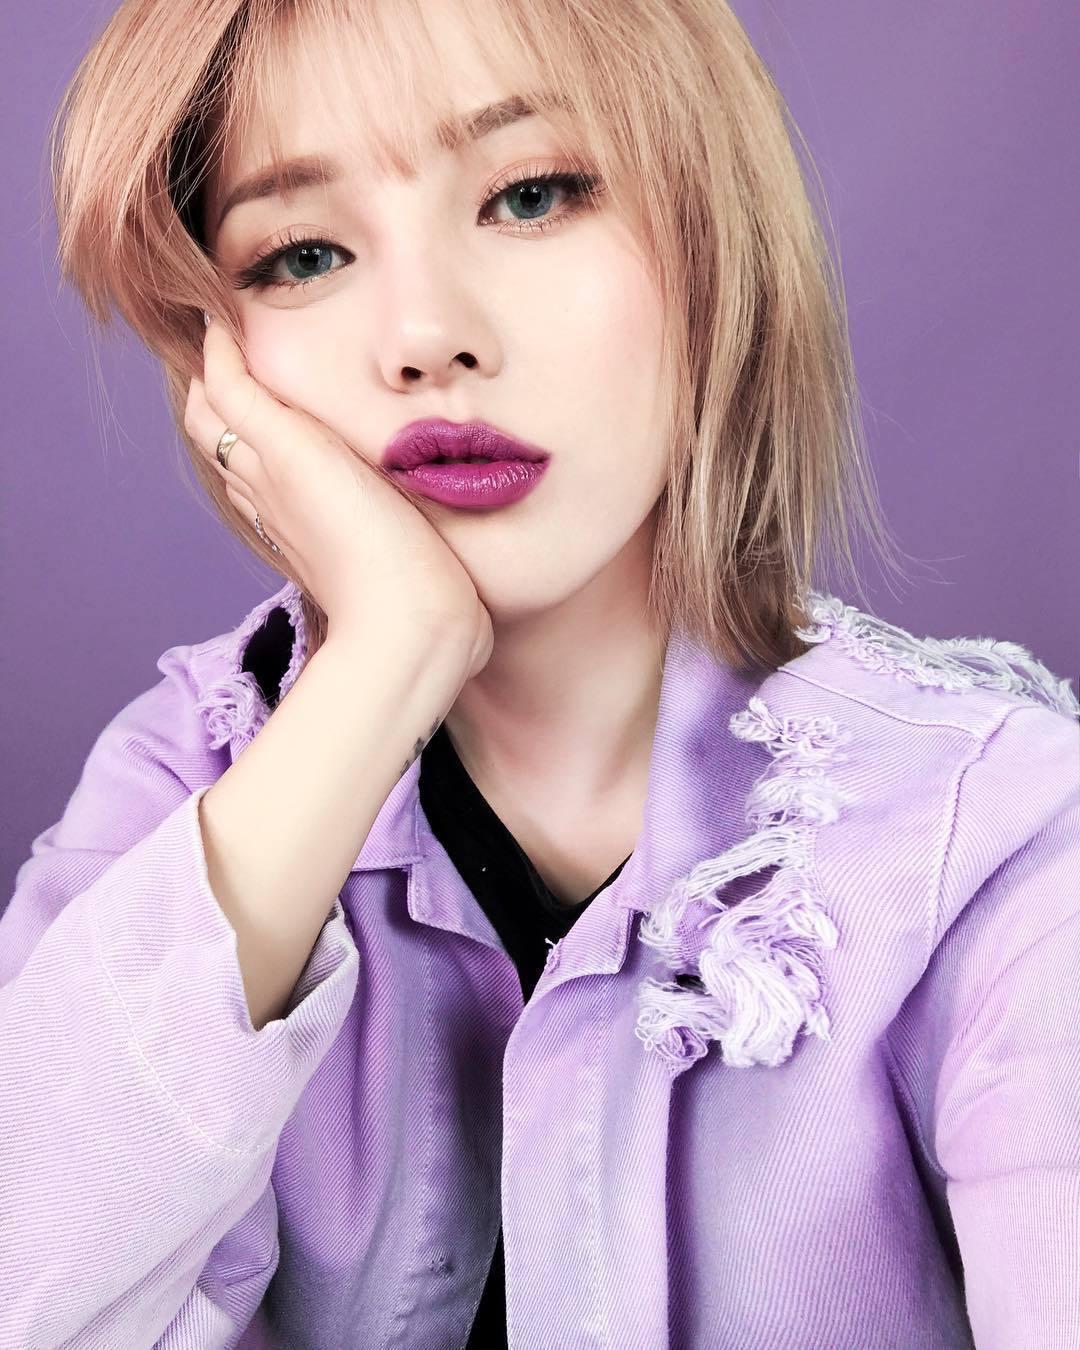 moi-berry-diem-danh-6-xu-huong-trang-diem-dang-chuan-bi-tiem-ngoi-vang